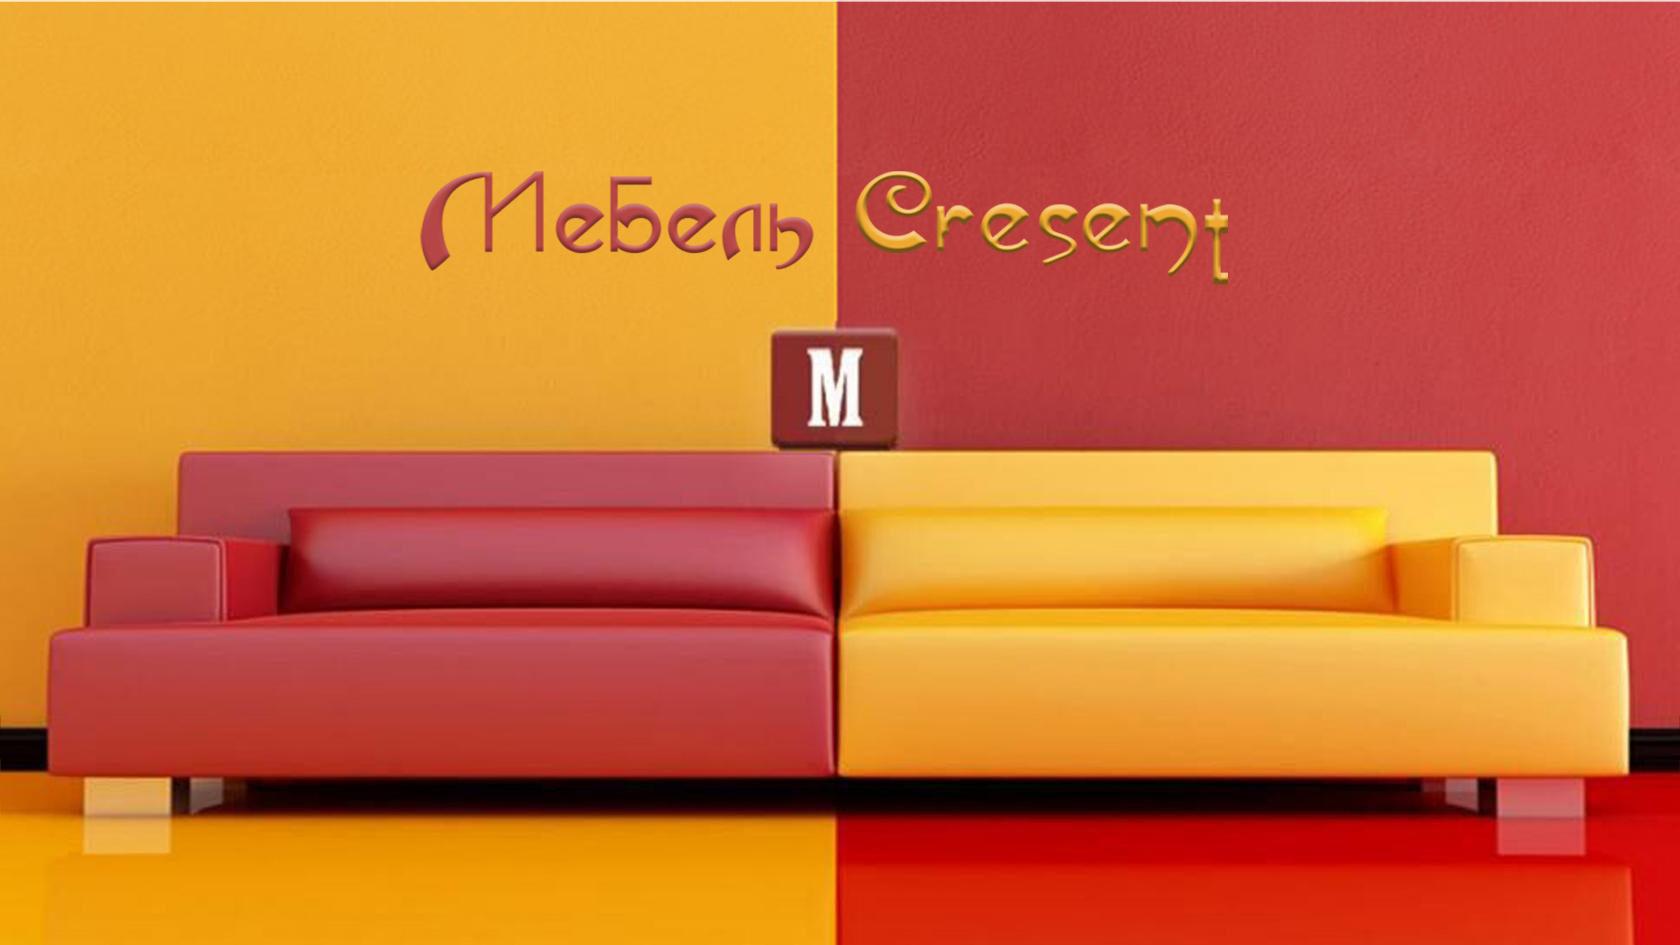 Мебельный салон Cresent